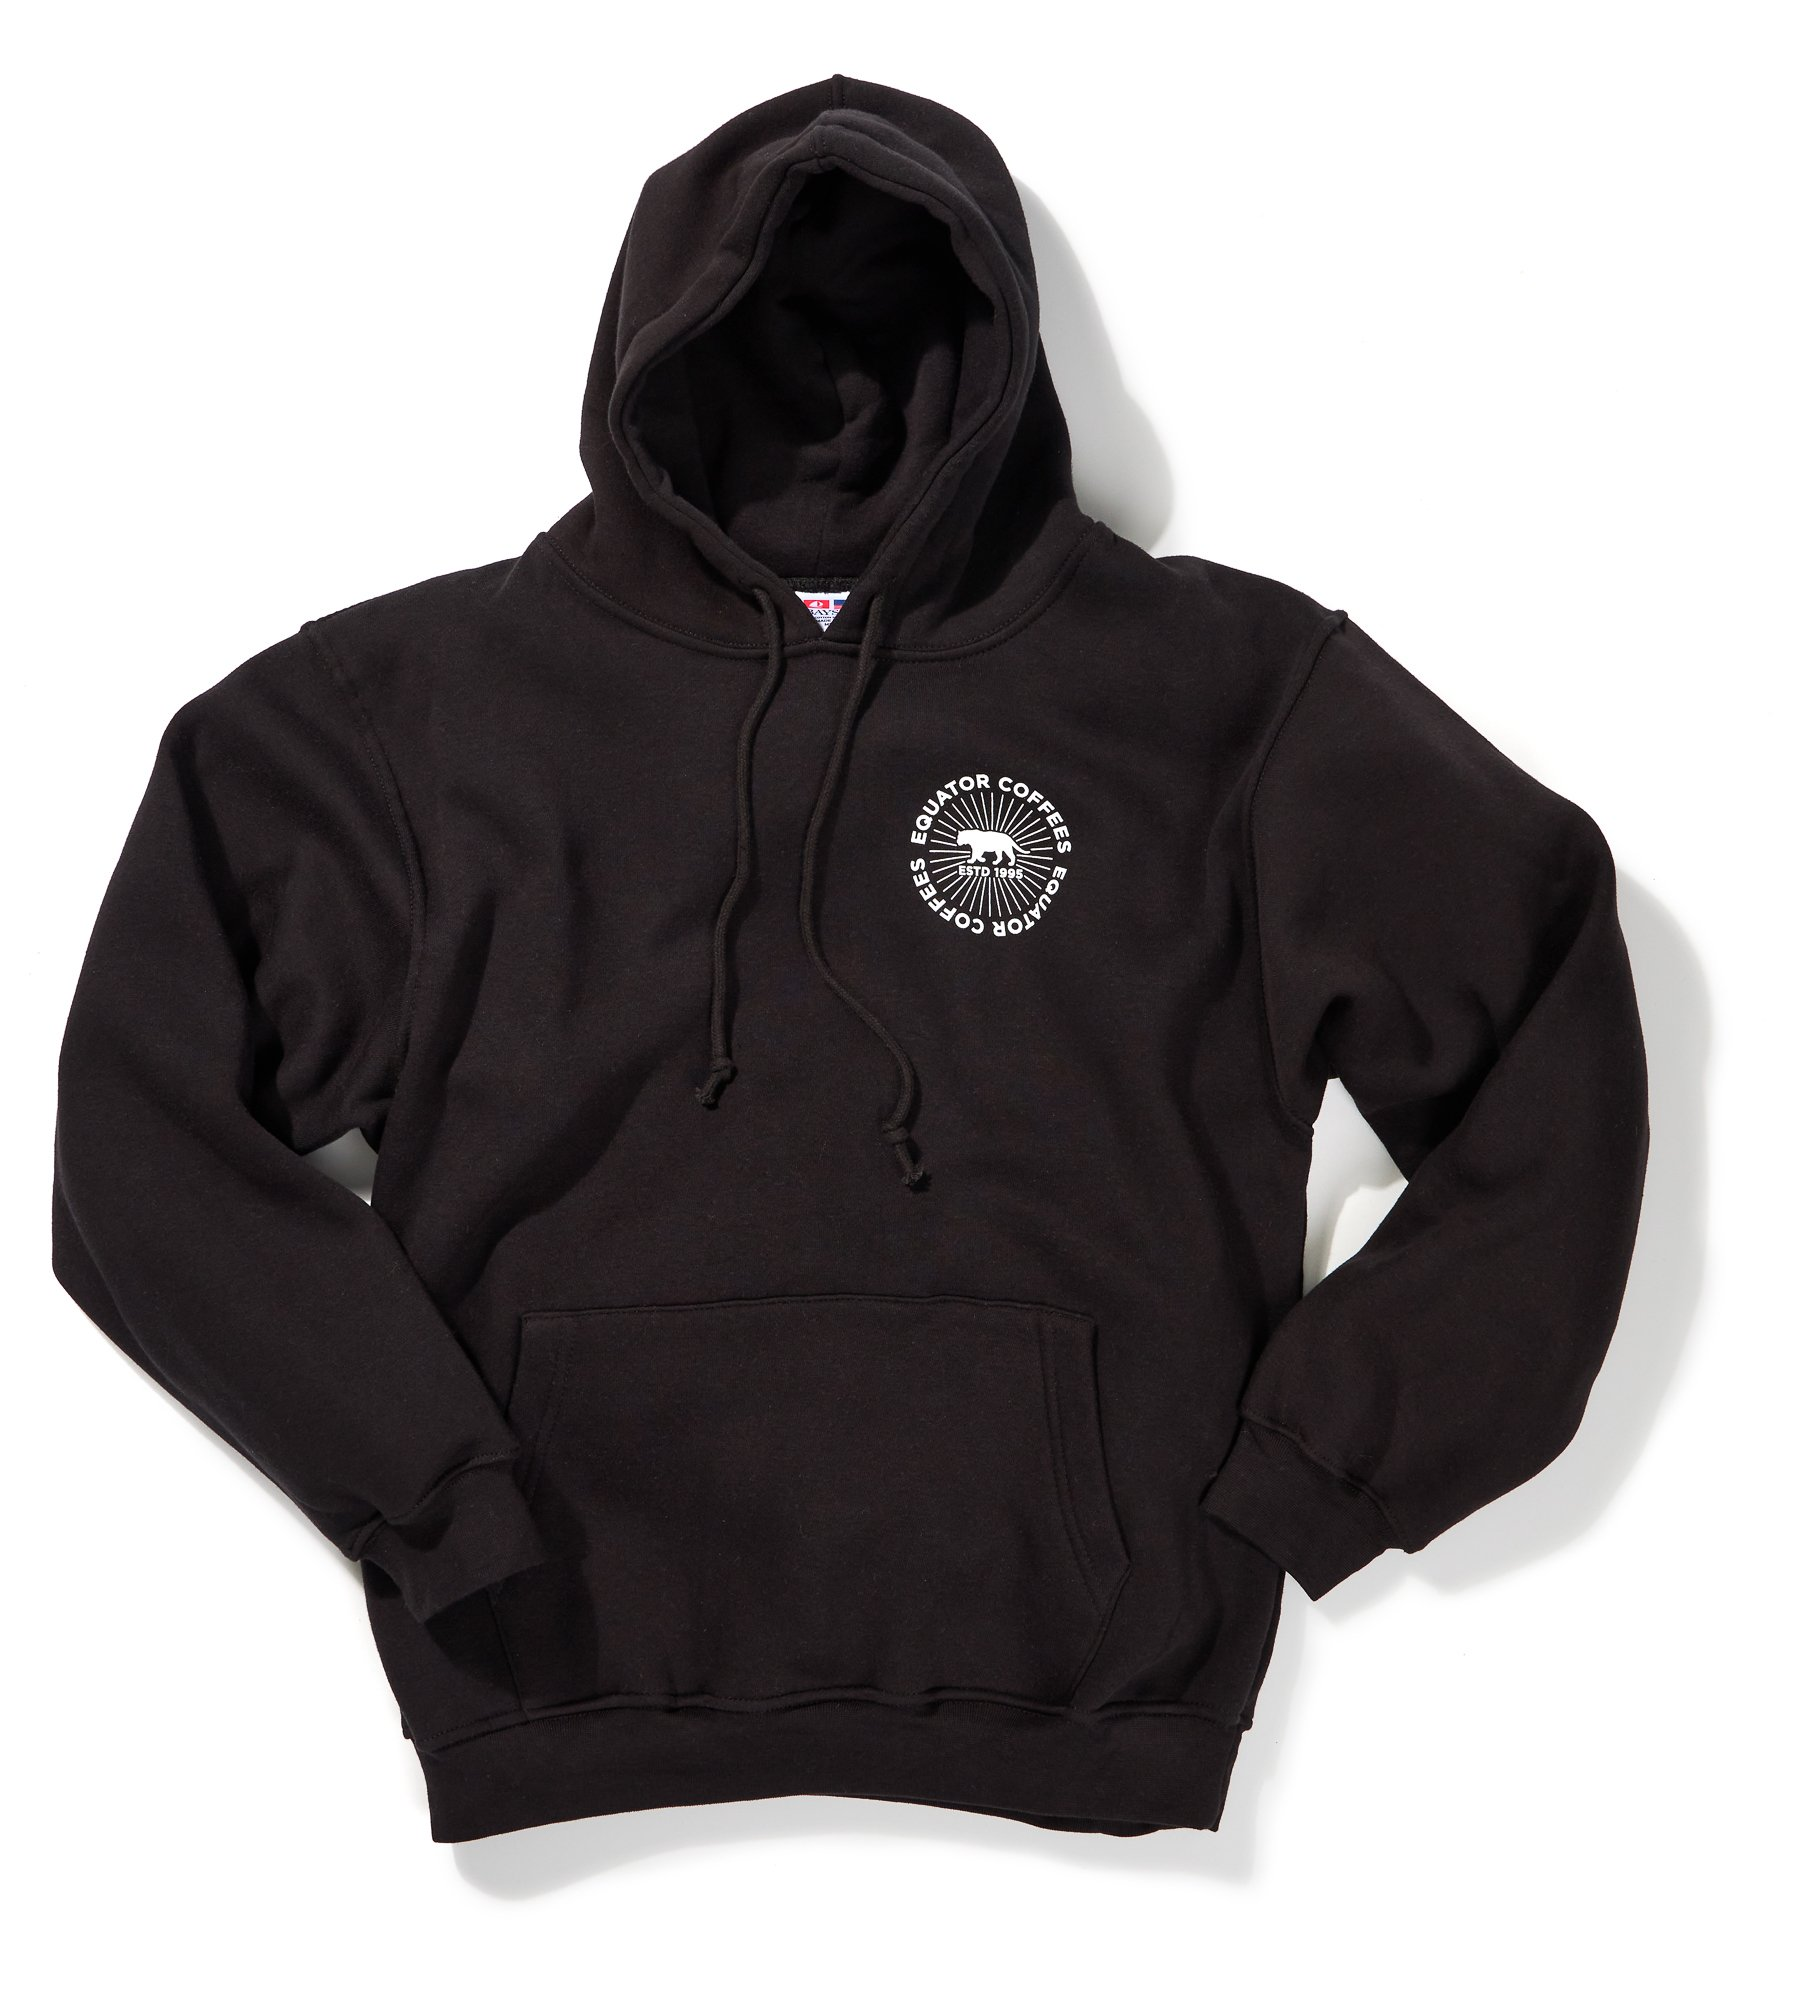 Starburst Hooded Sweatshirt